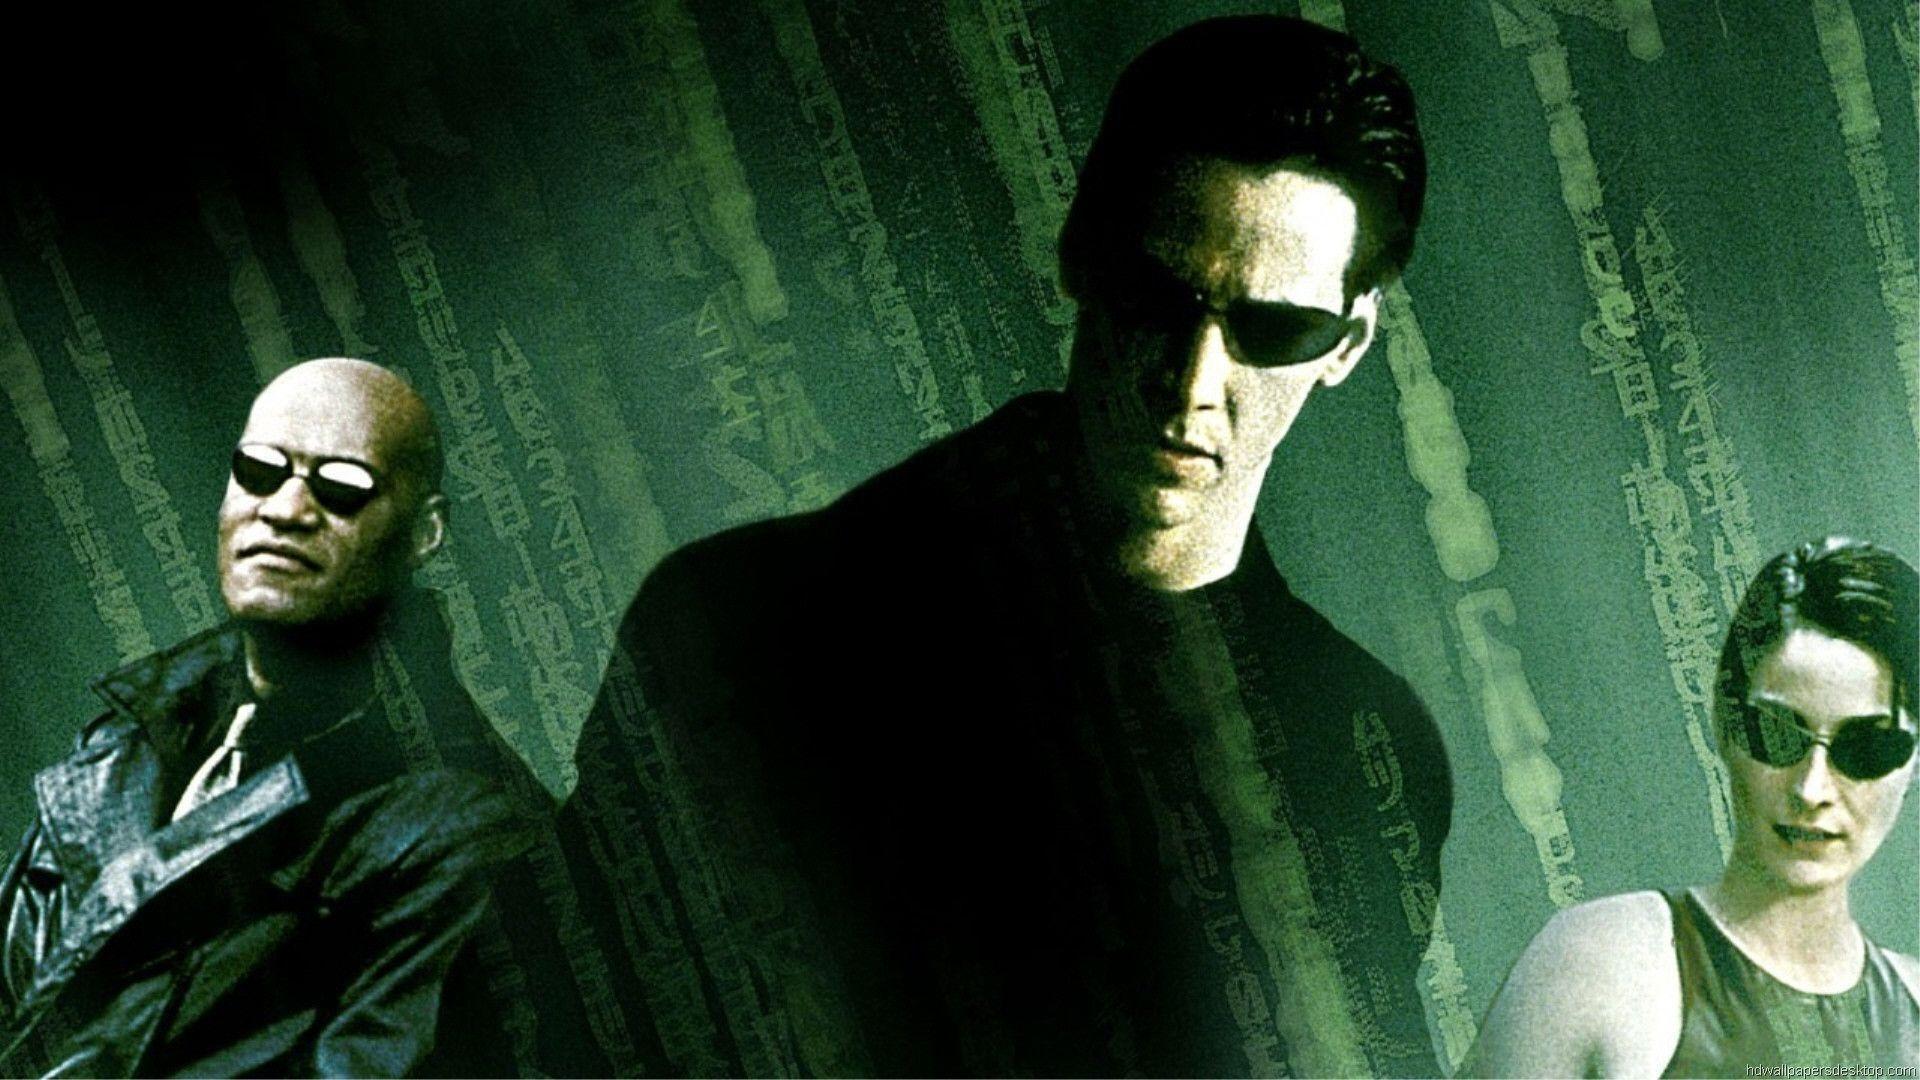 Картинки по запросу matrix film wallpaper